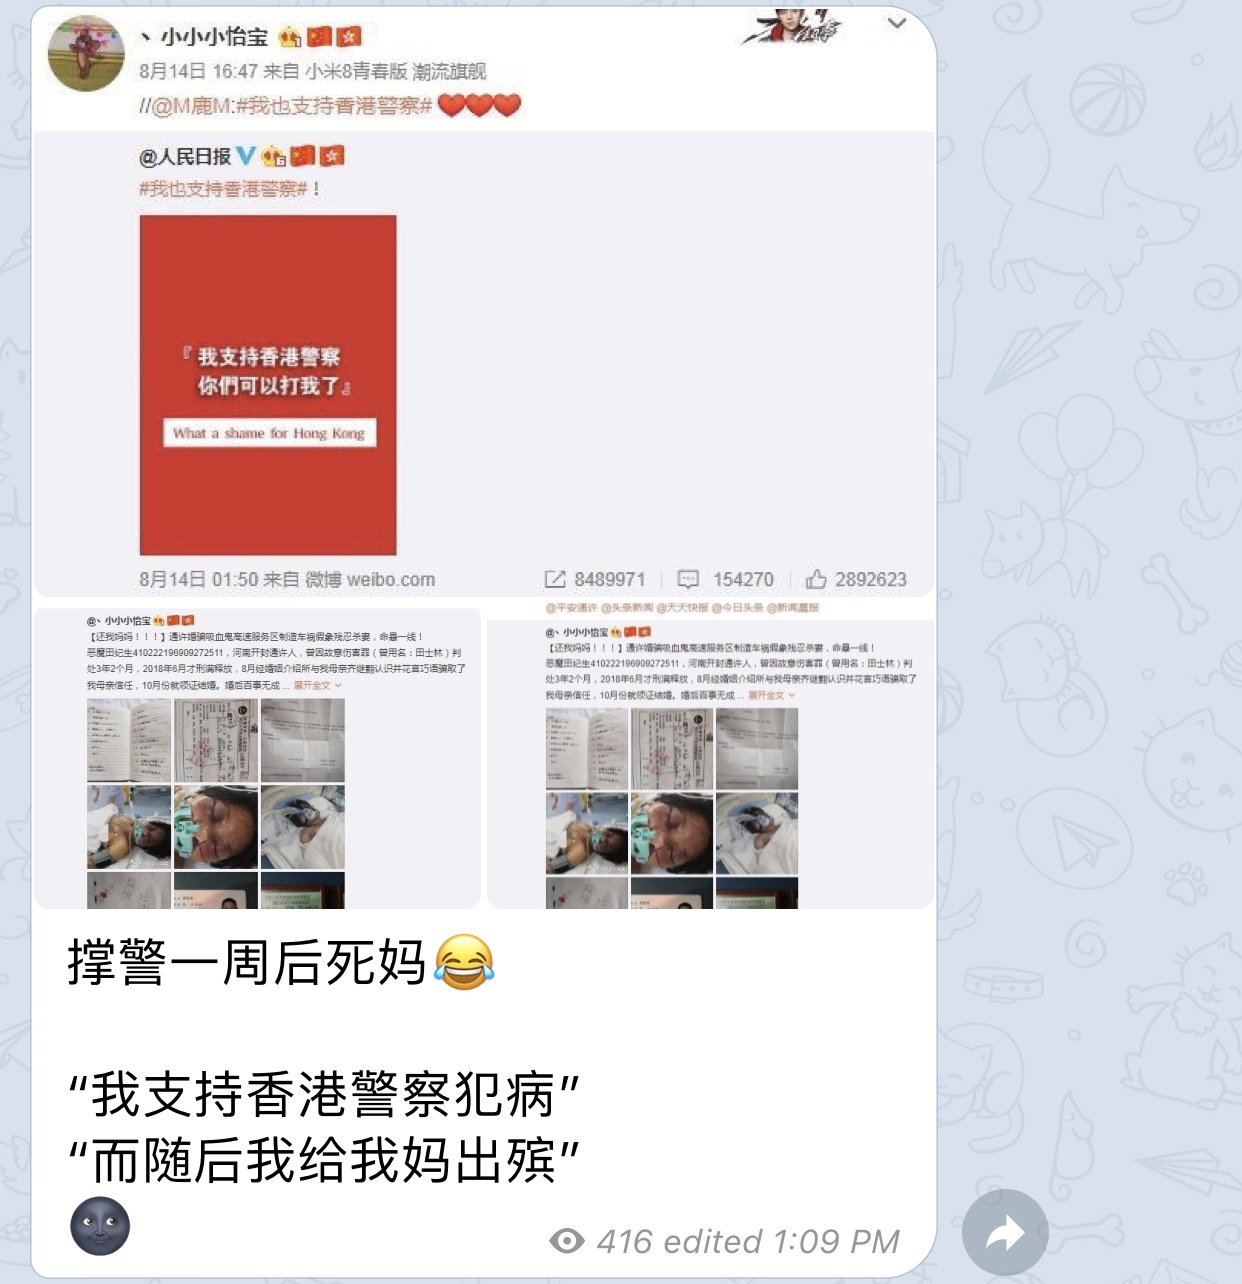 [img]https://upload.cc/i1/2019/08/21/UjunLV.png[/img]